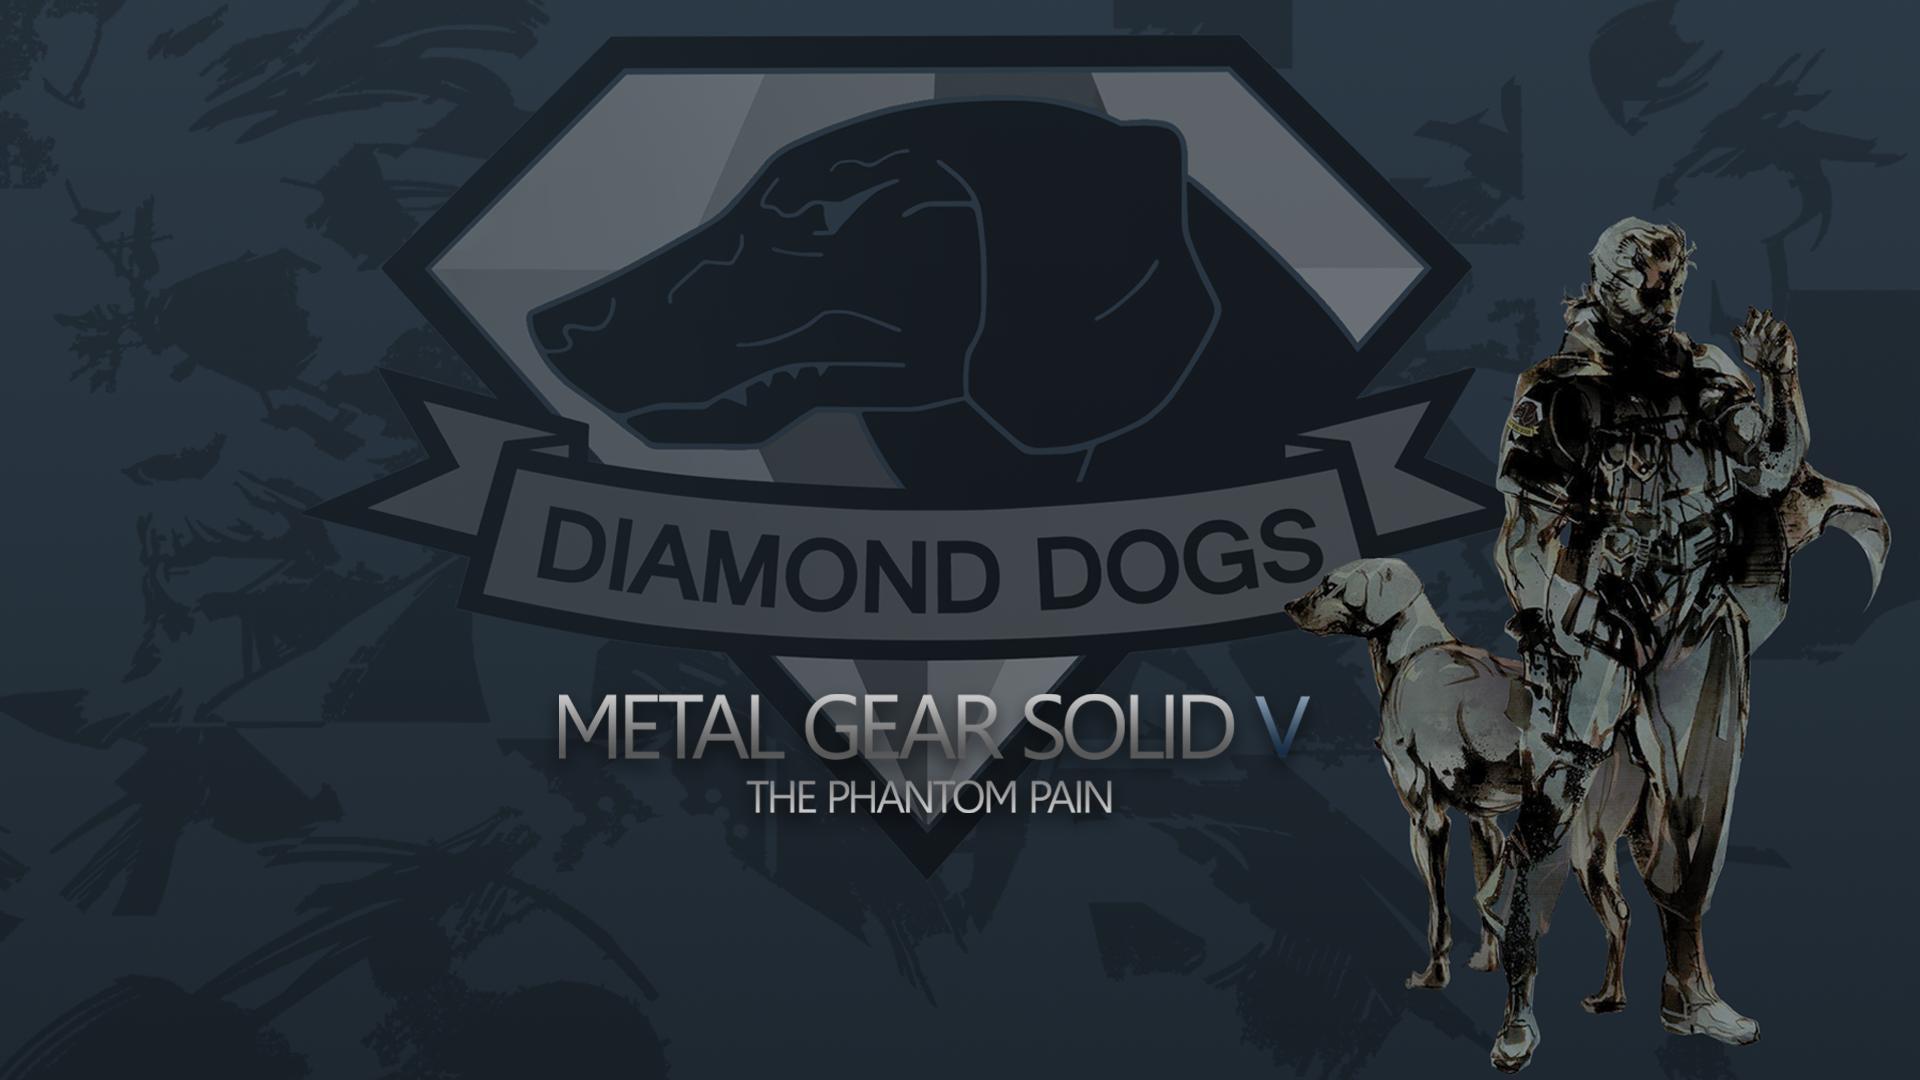 mgsv diamond dogs wallpaper by sleepingsandman on